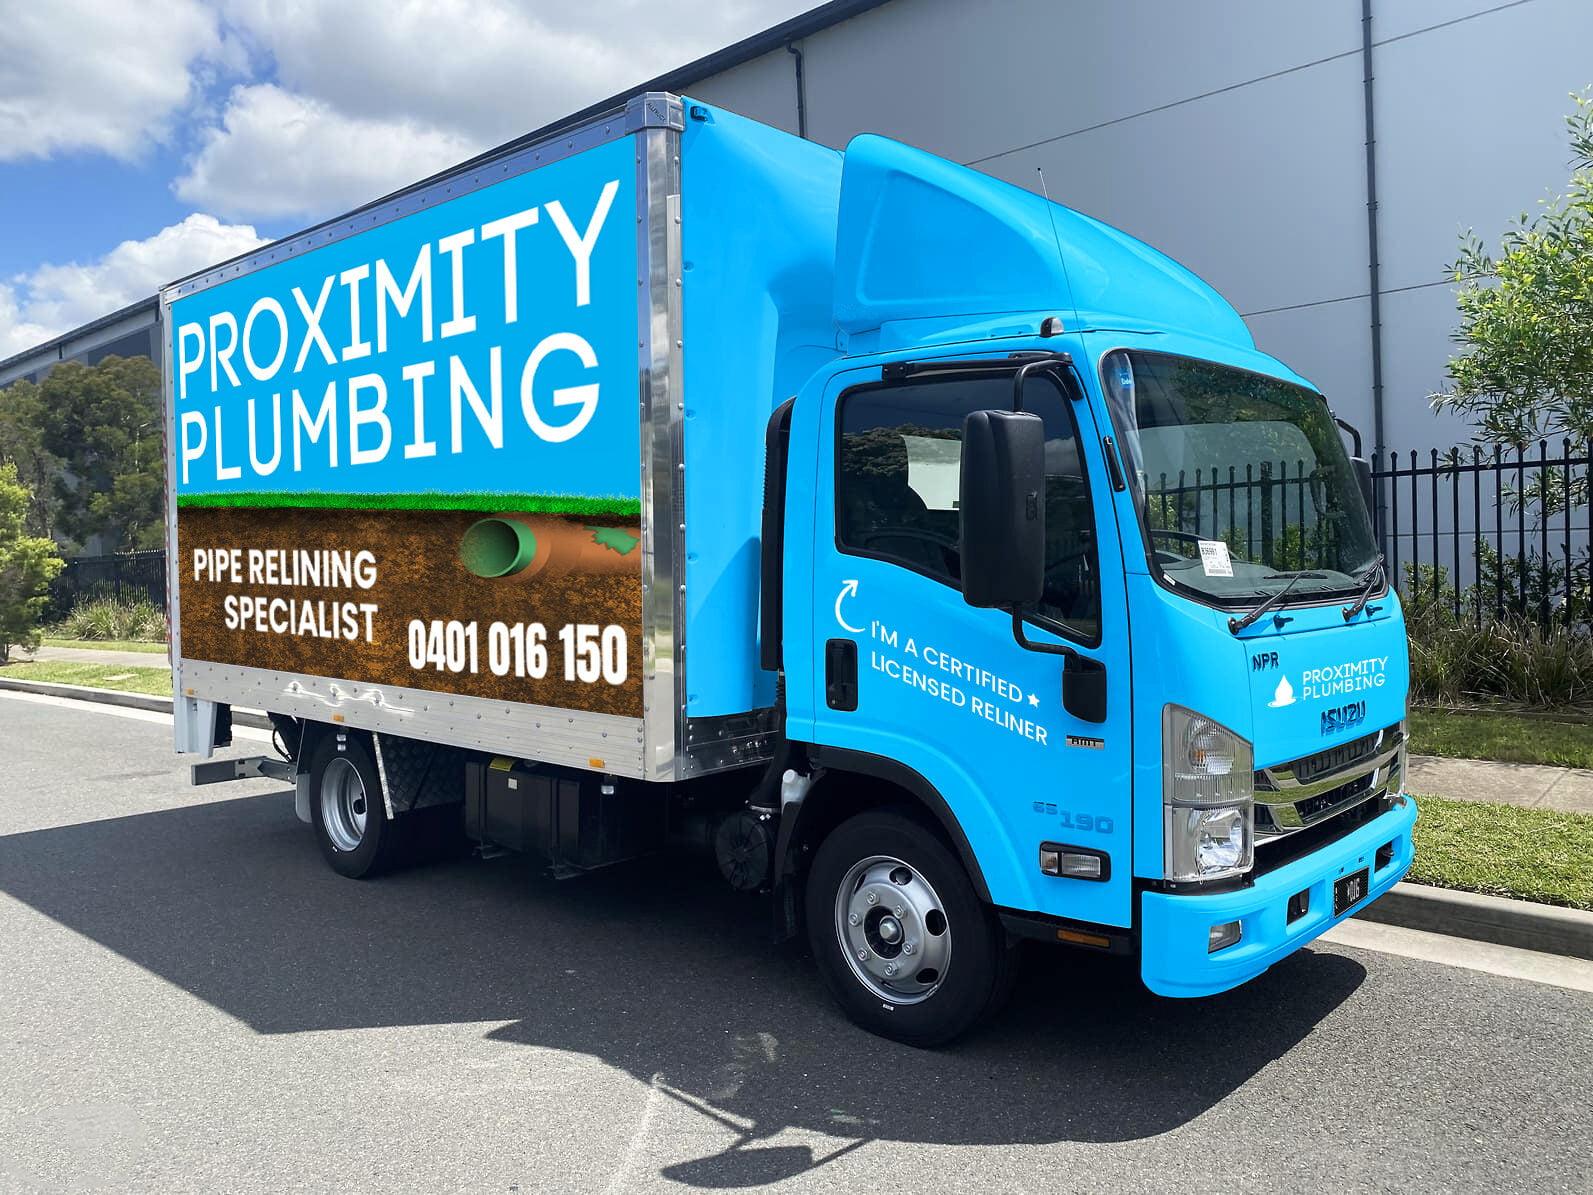 https://proximityplumbing.com.au/wp-content/uploads/2021/01/Pipe-Relining-Sydney-e1611103770855.jpg